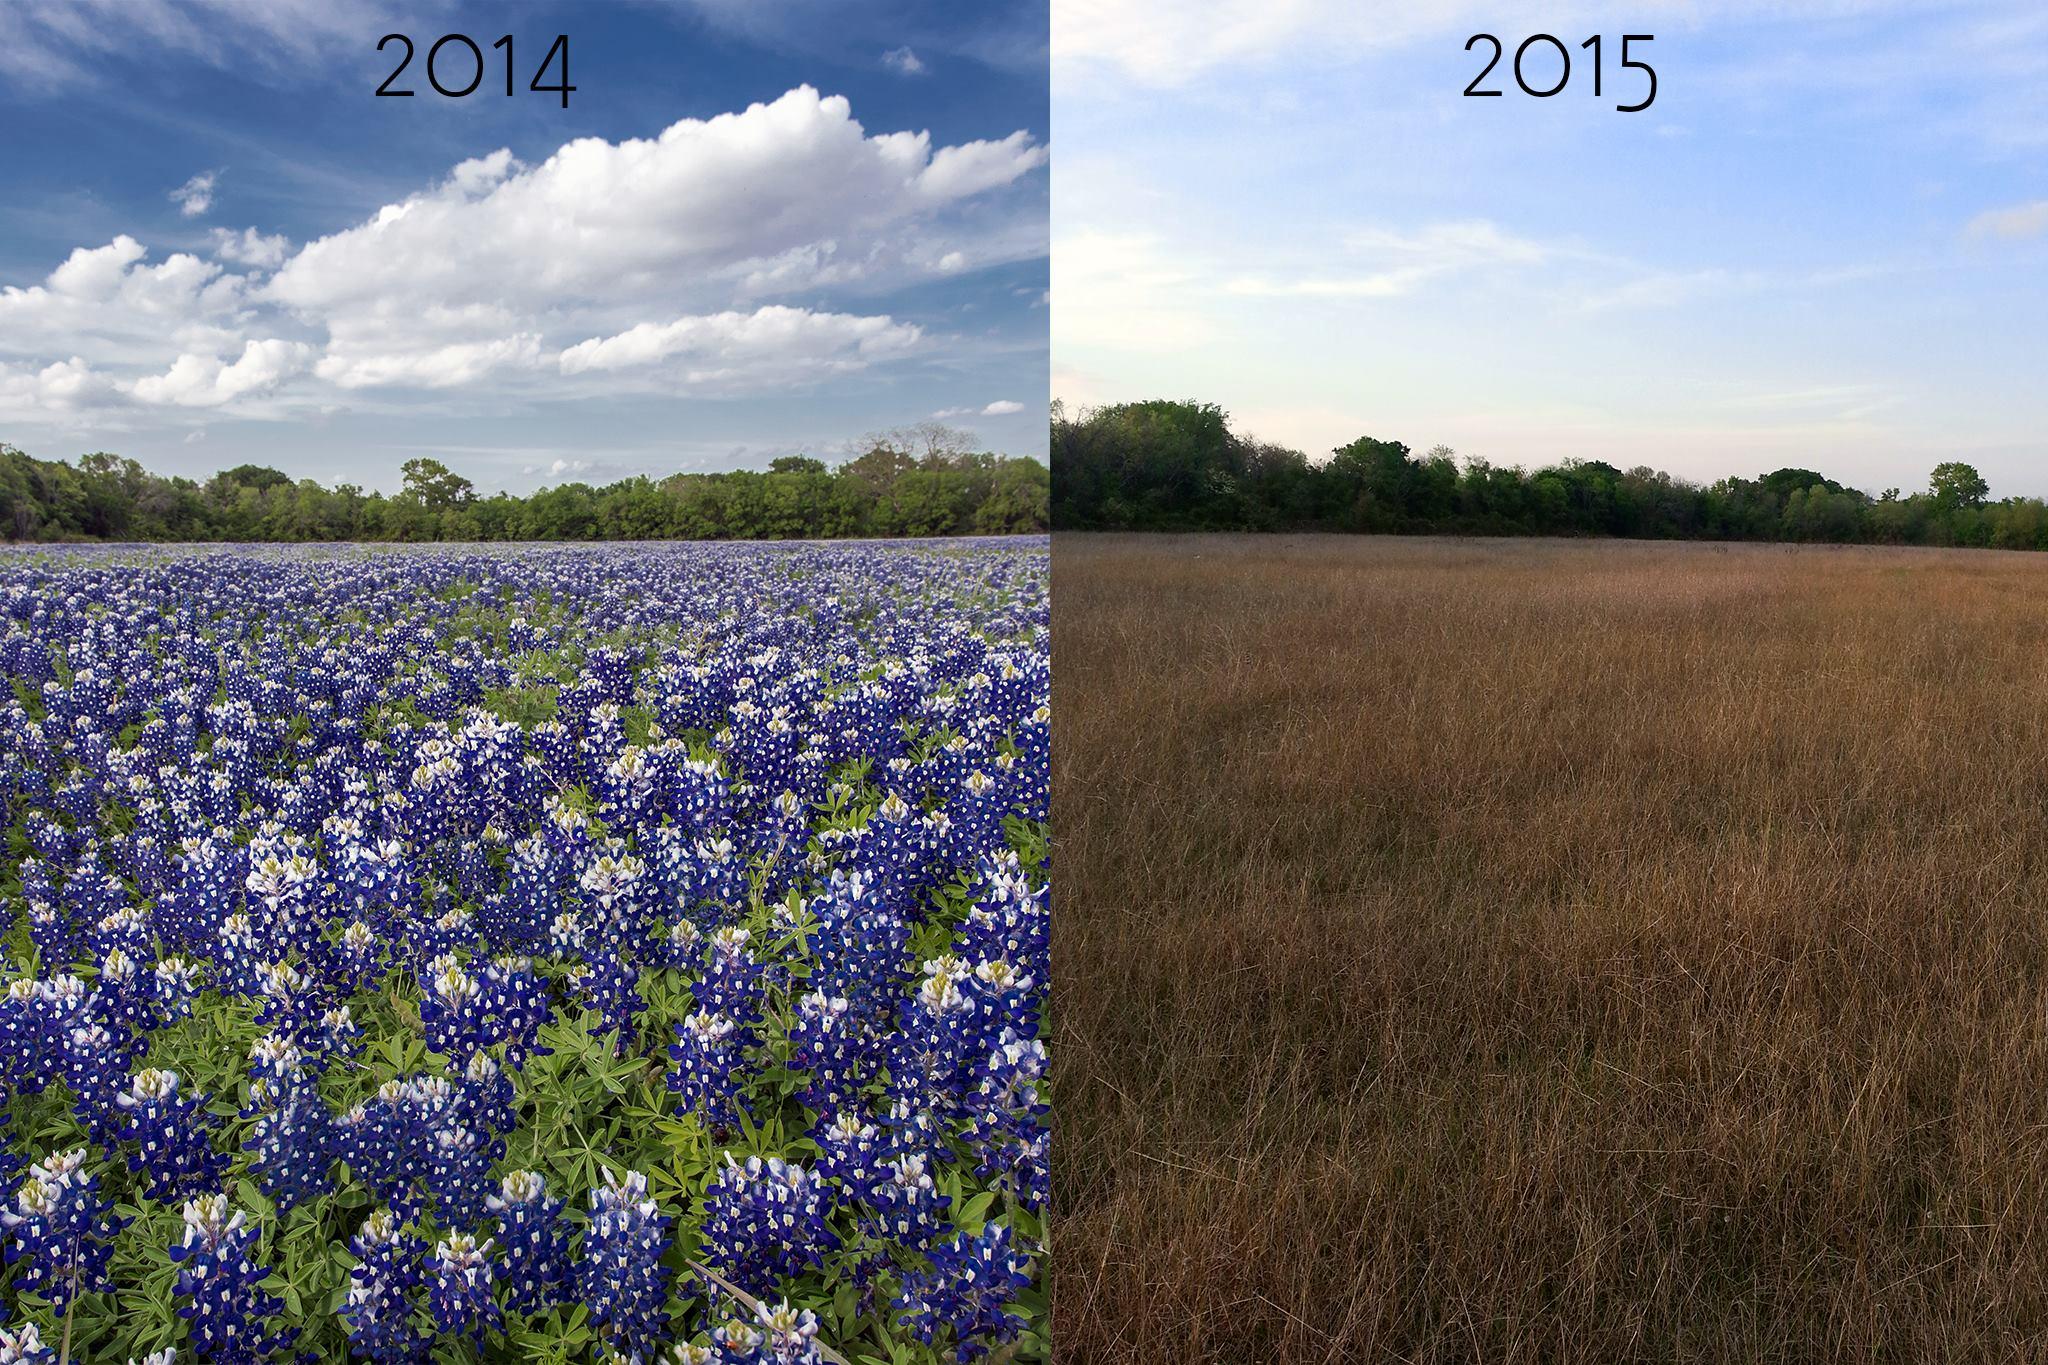 Same location in the same field in Round Rock, Texas. Shots were taken one year apart.